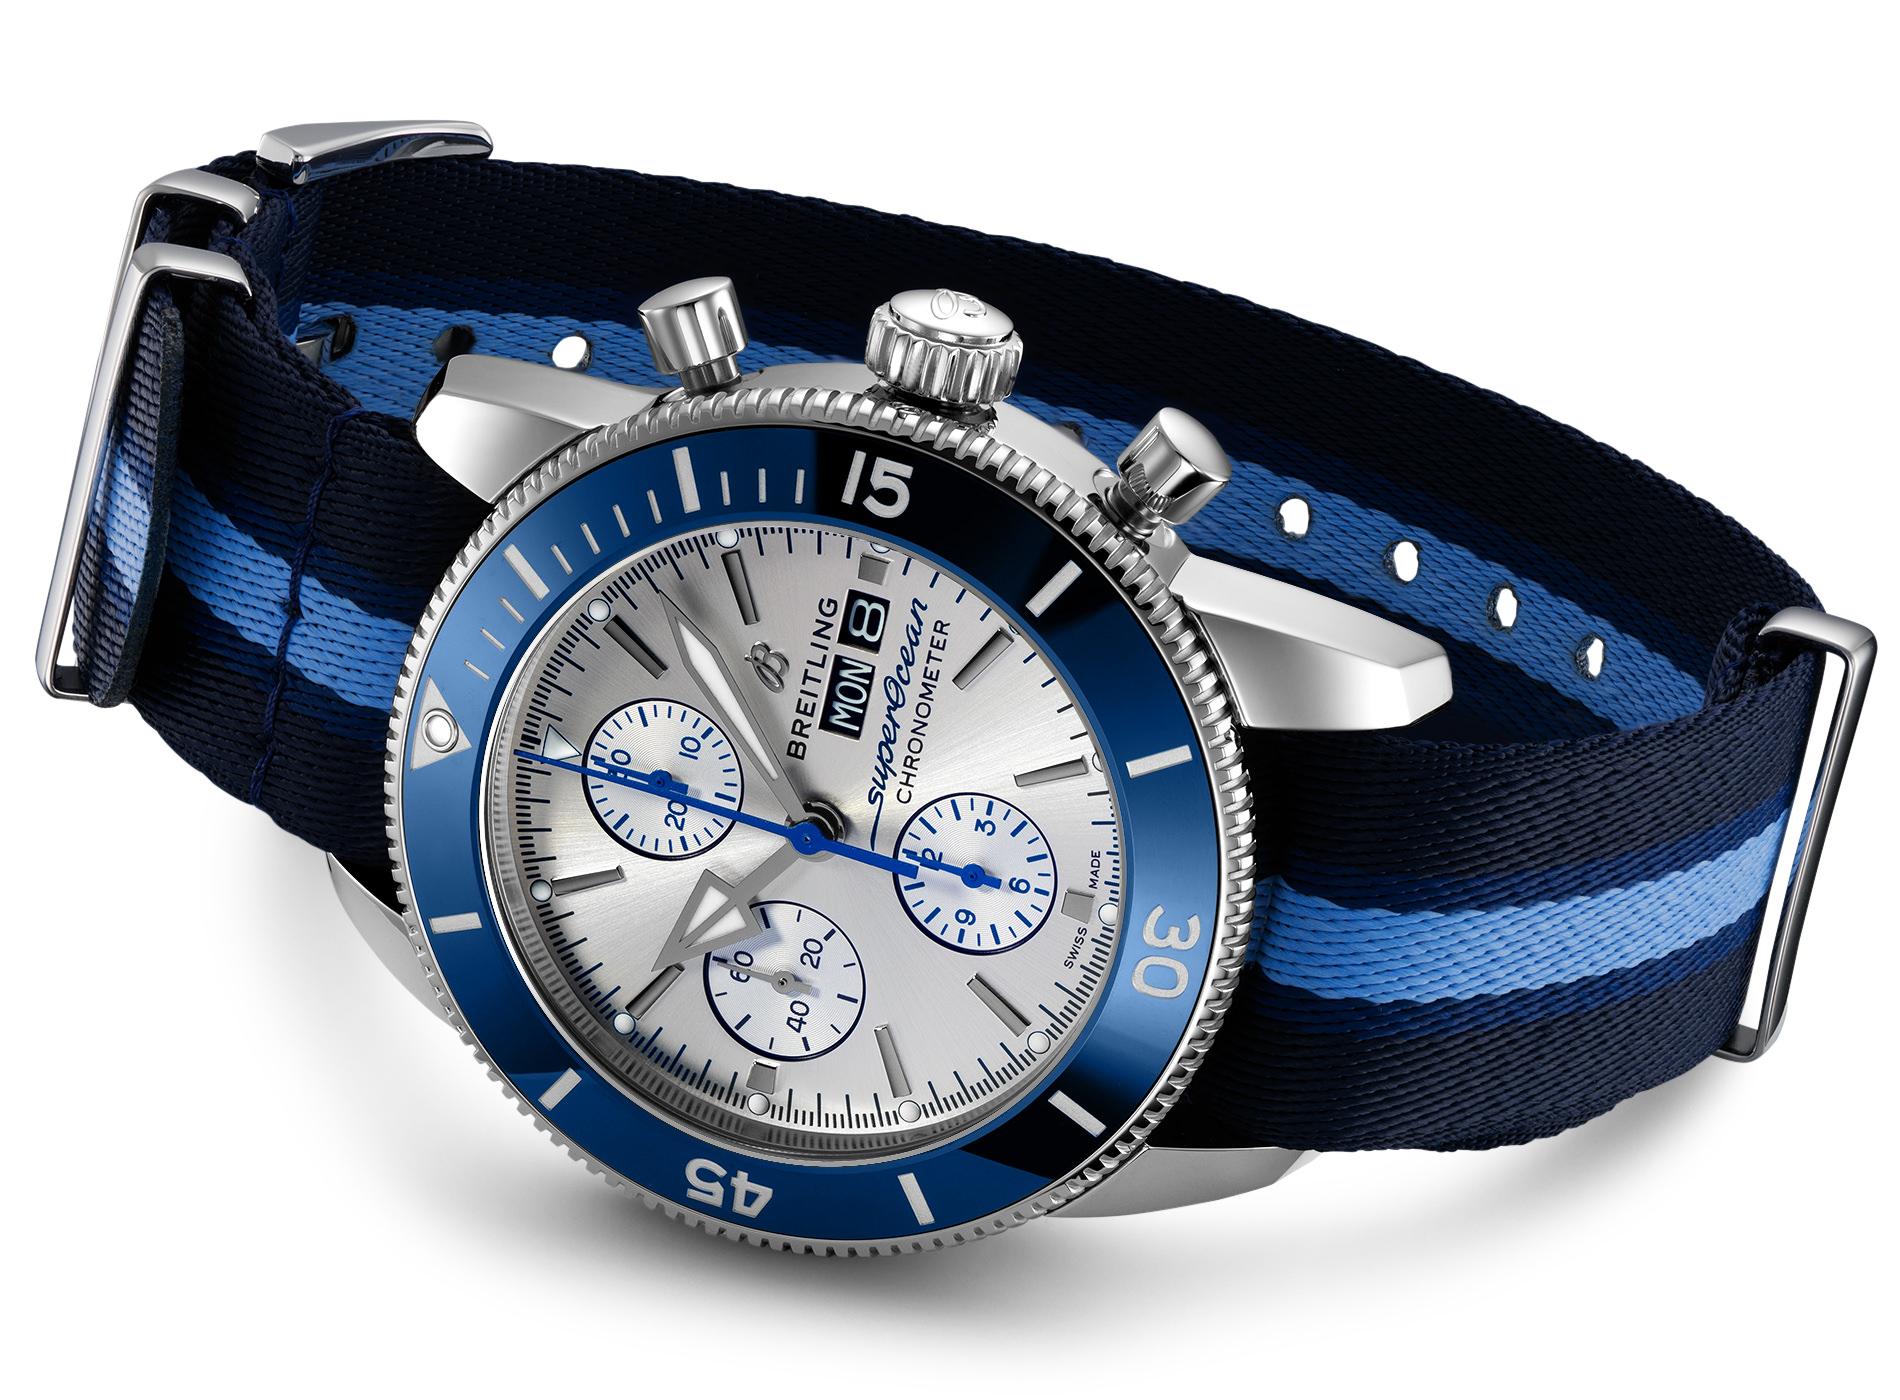 Meilleures Montres de Plongée Breitling Superocean Heritage Ocean Conservancy Limited Edition